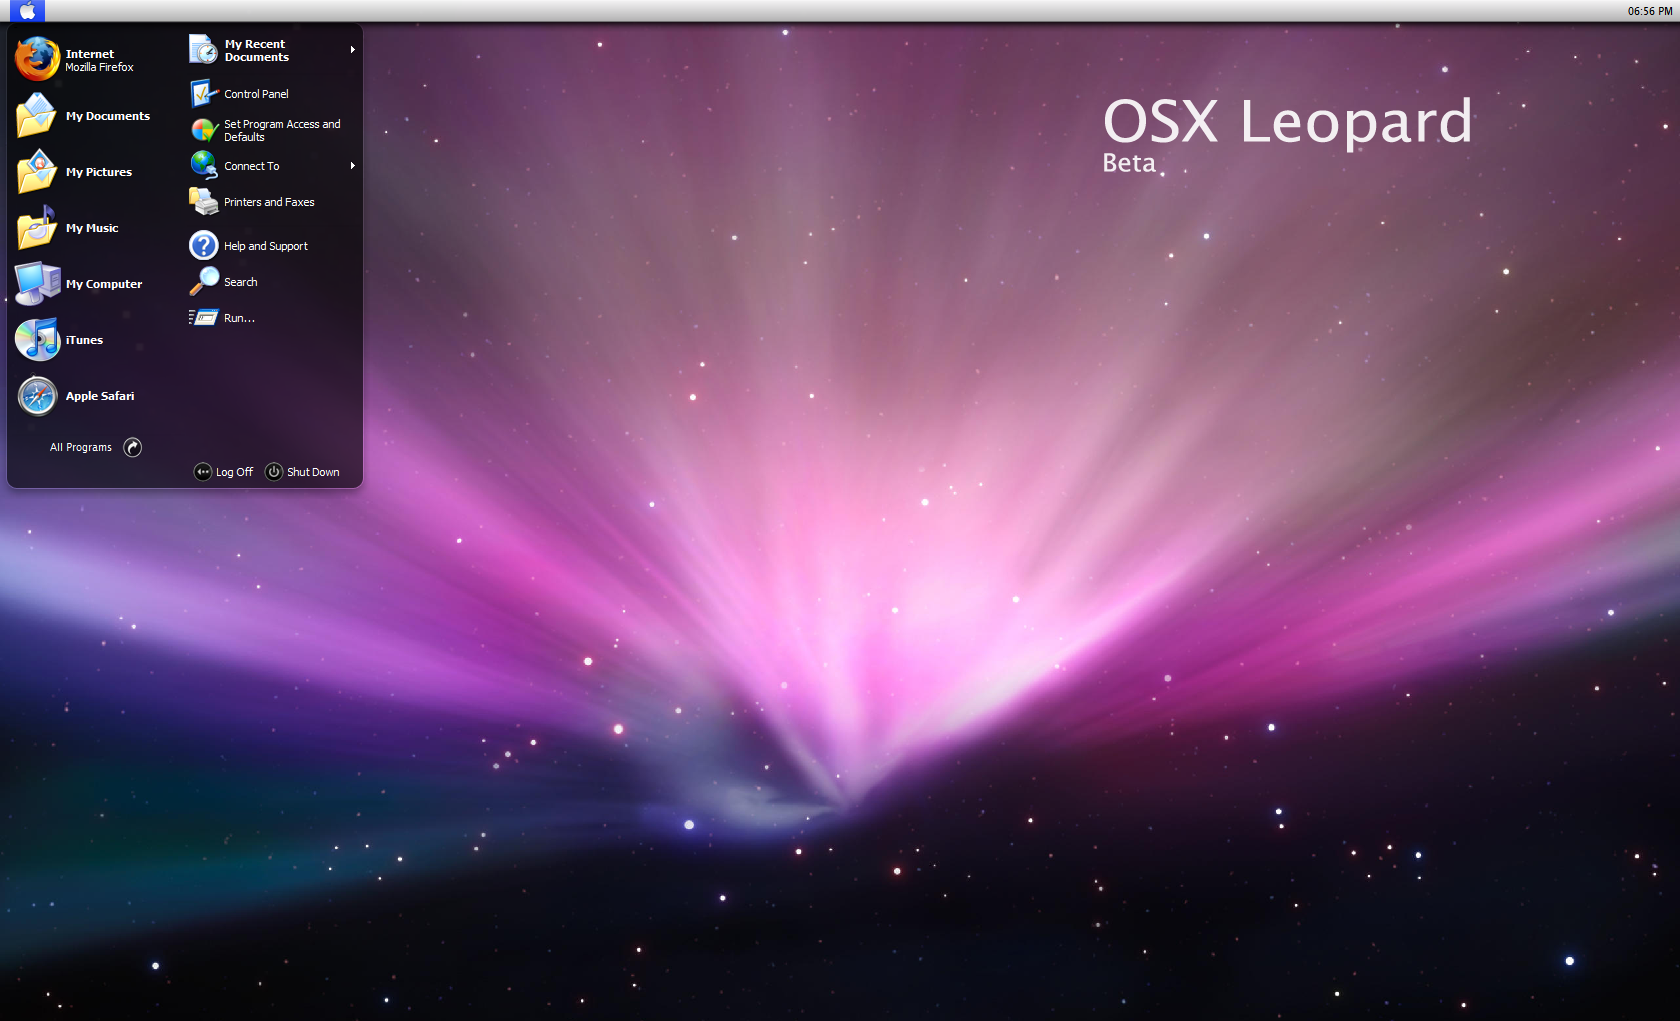 OSX Leopard beta 0.2 by dobee